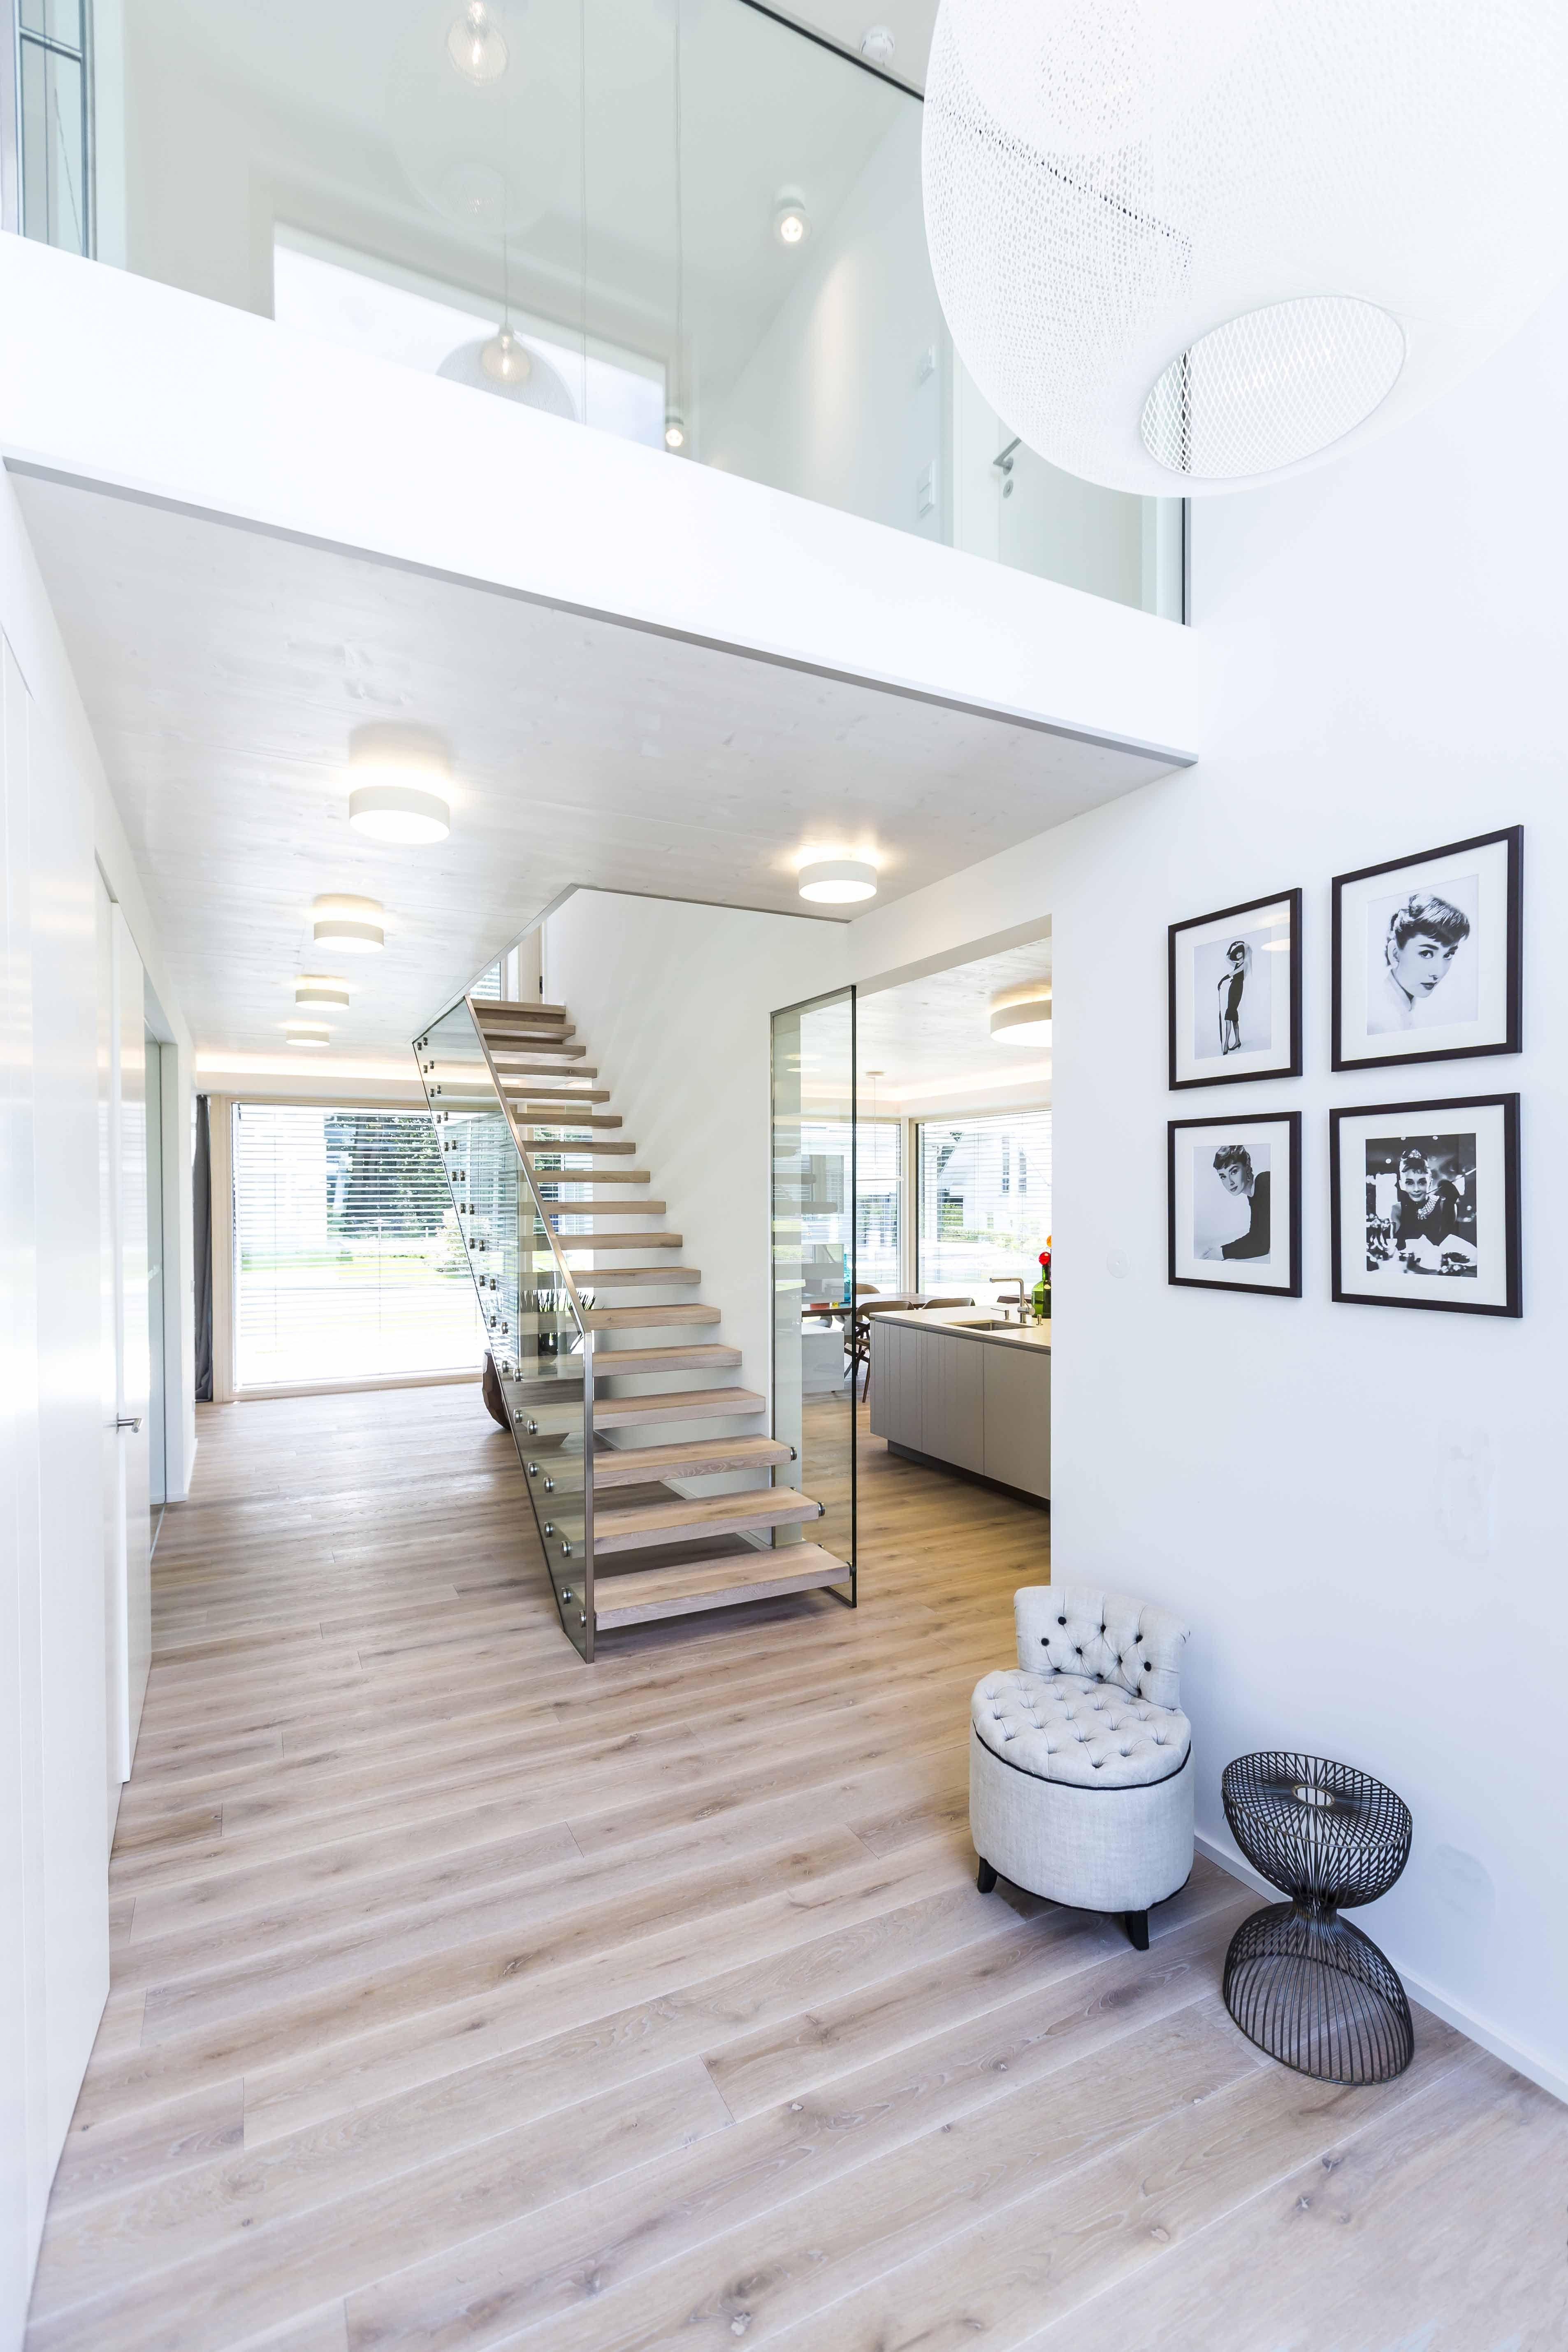 Bünck Architektur :: langenfeld 2016 | Ideal Home | Pinterest ...